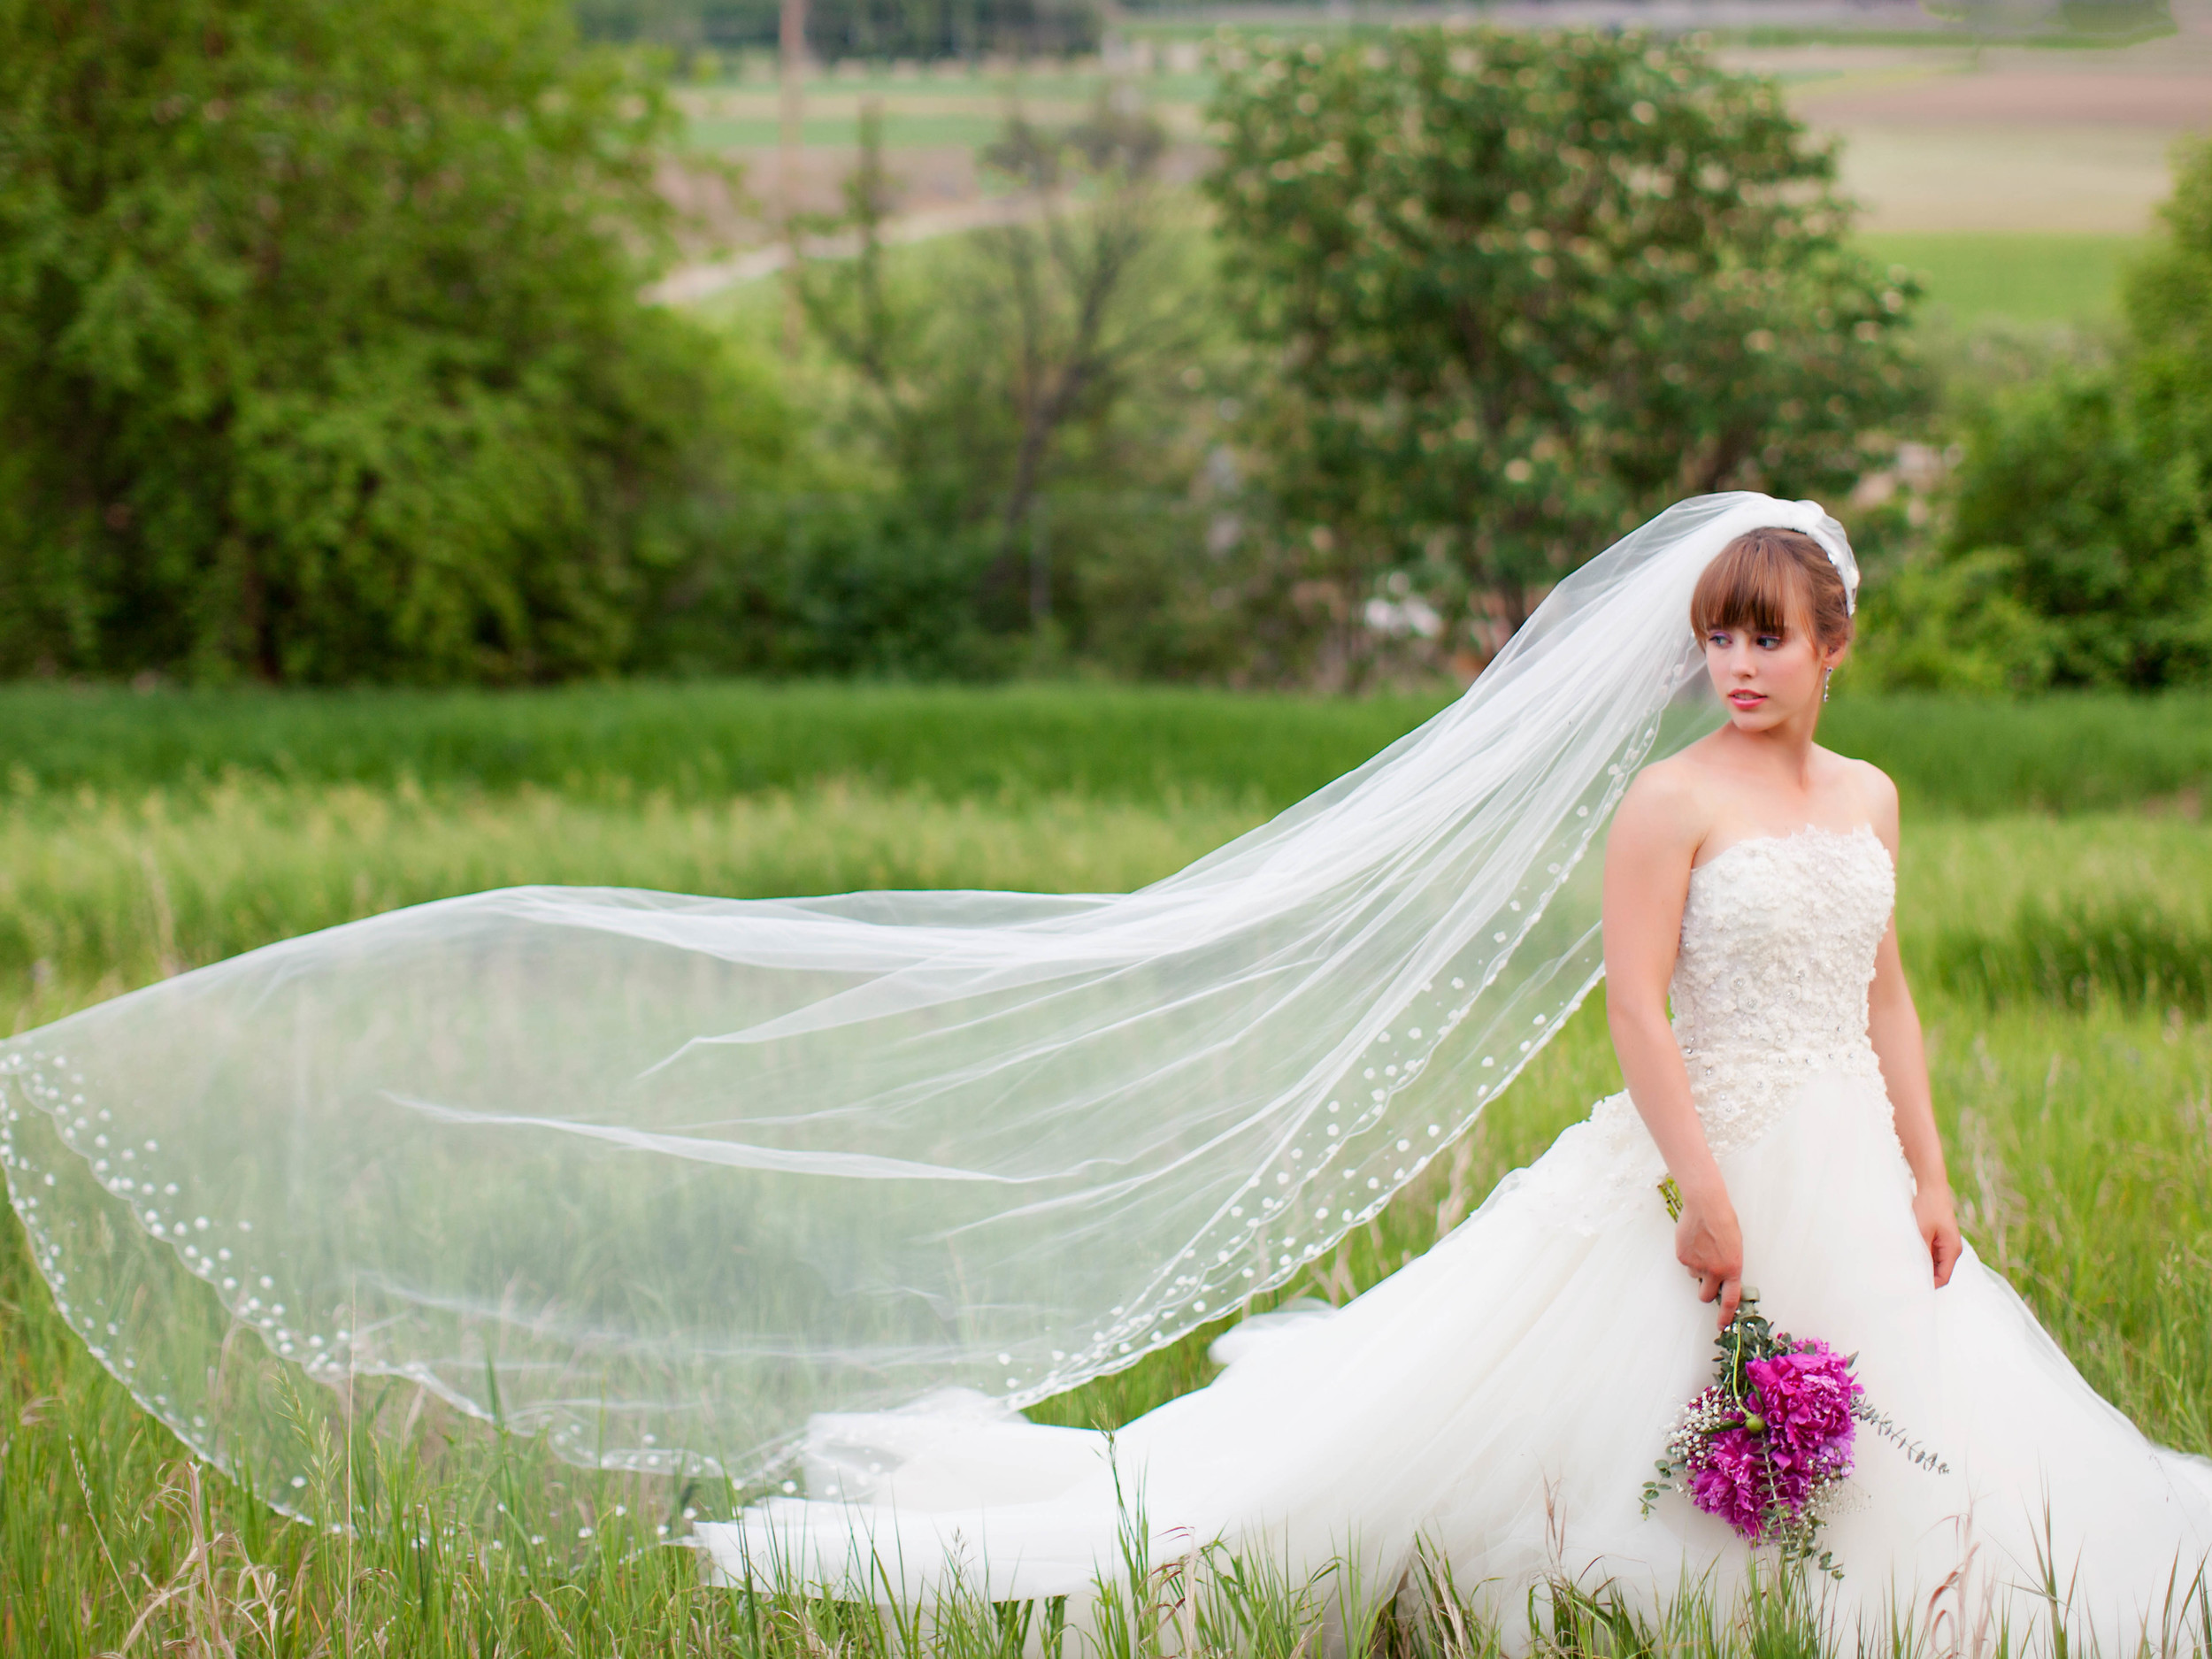 tg-wedding-photogrpahy-13.jpg